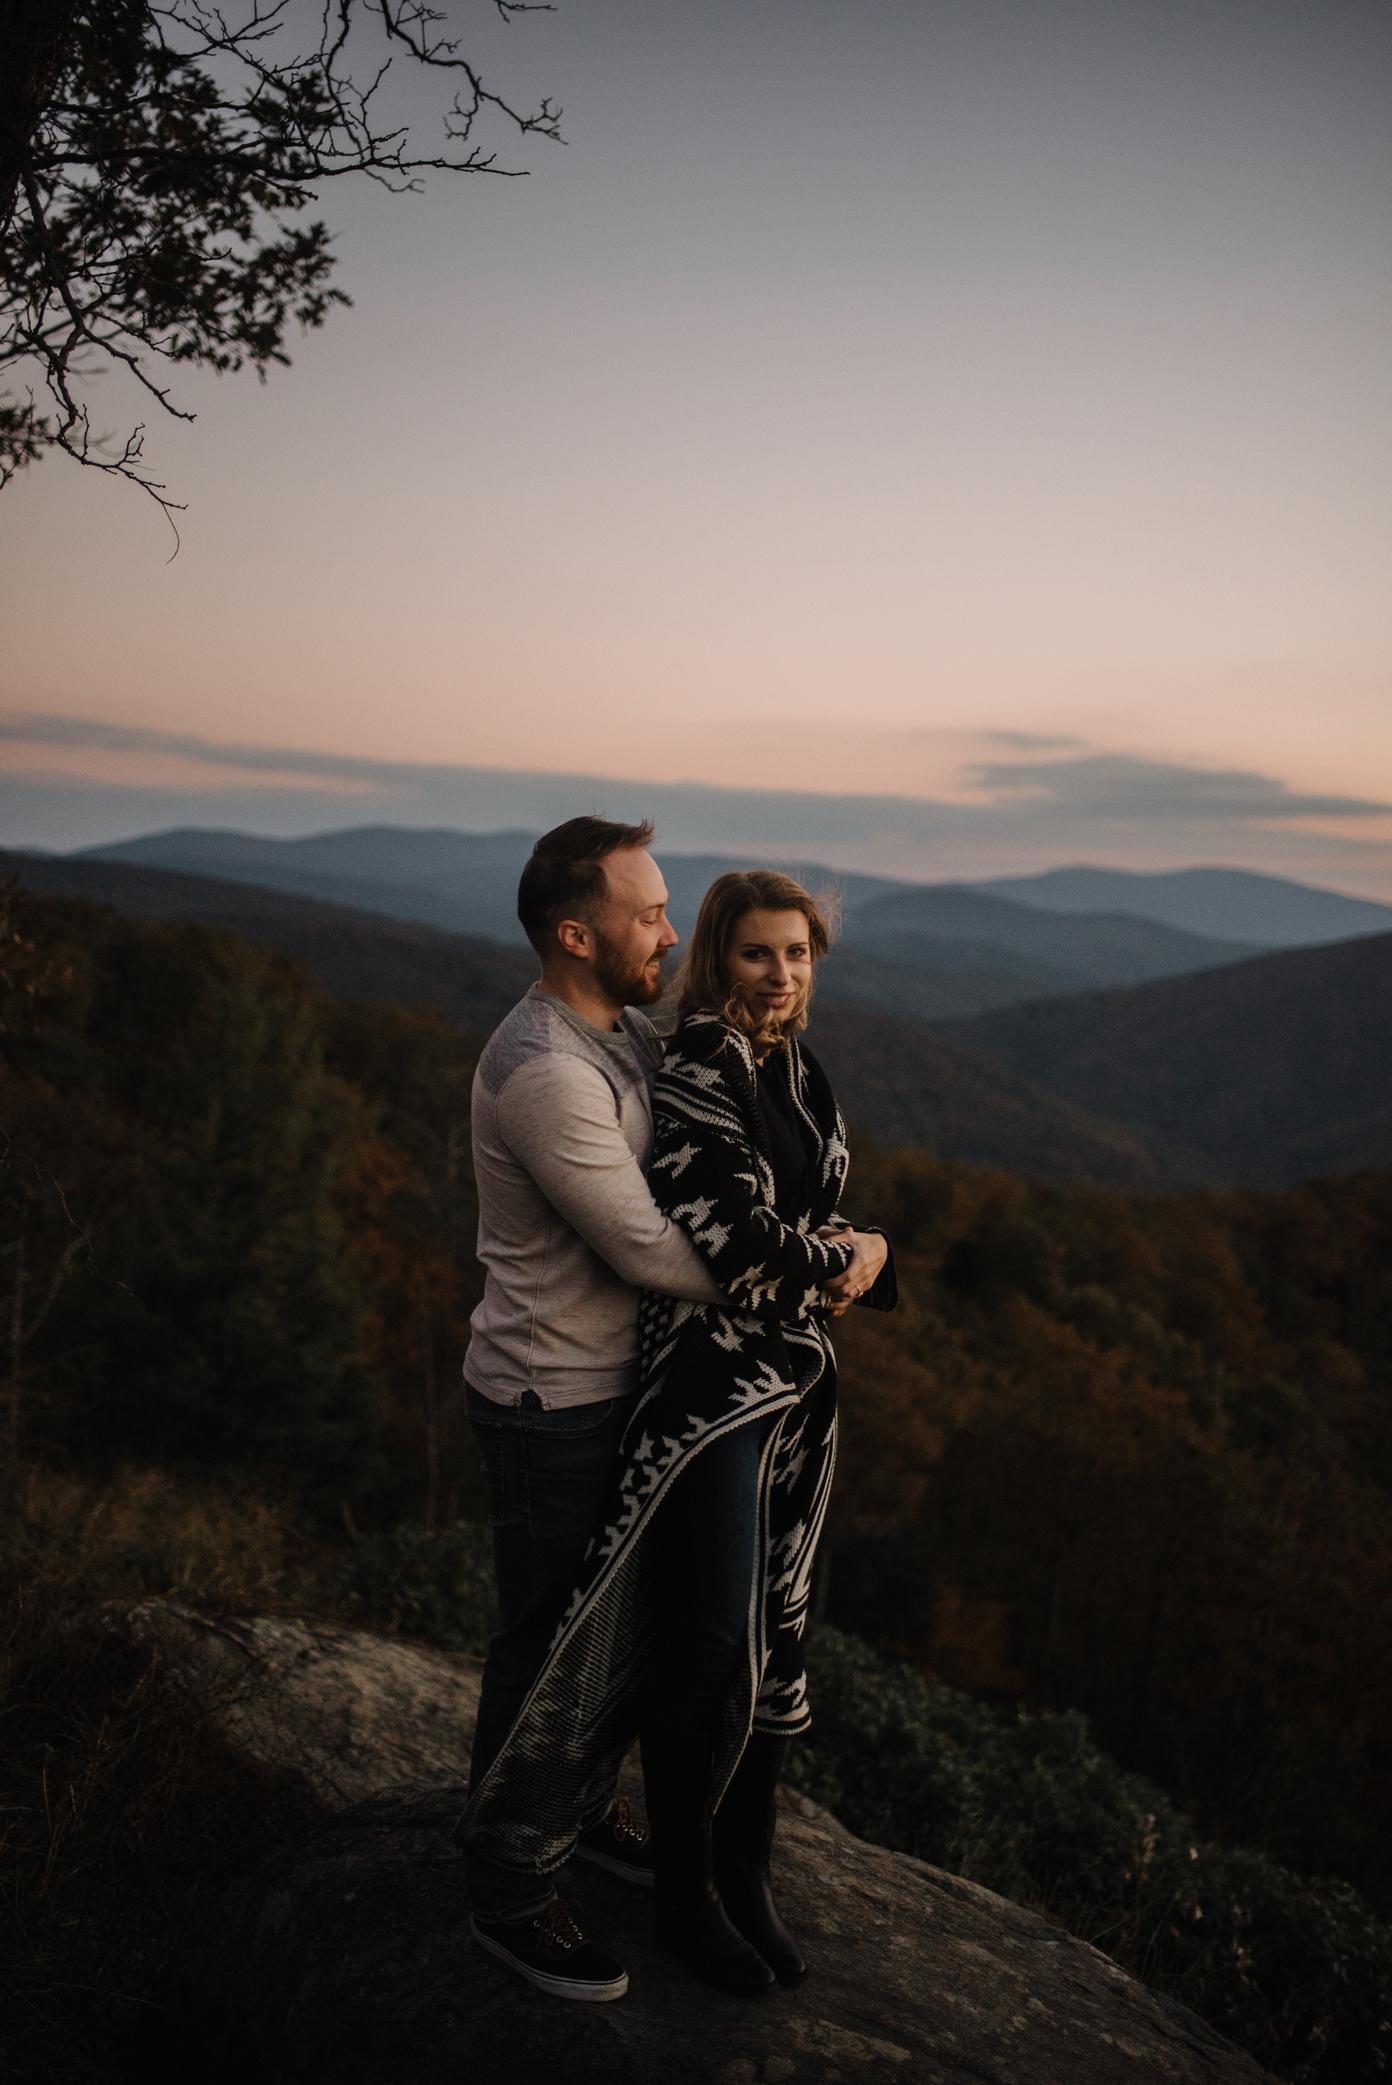 Macy and Mark - Shenandoah National Park - Fall Autumn Sunrise Couple Adventure Session - White Sails Creative - Mini Session_3.JPG